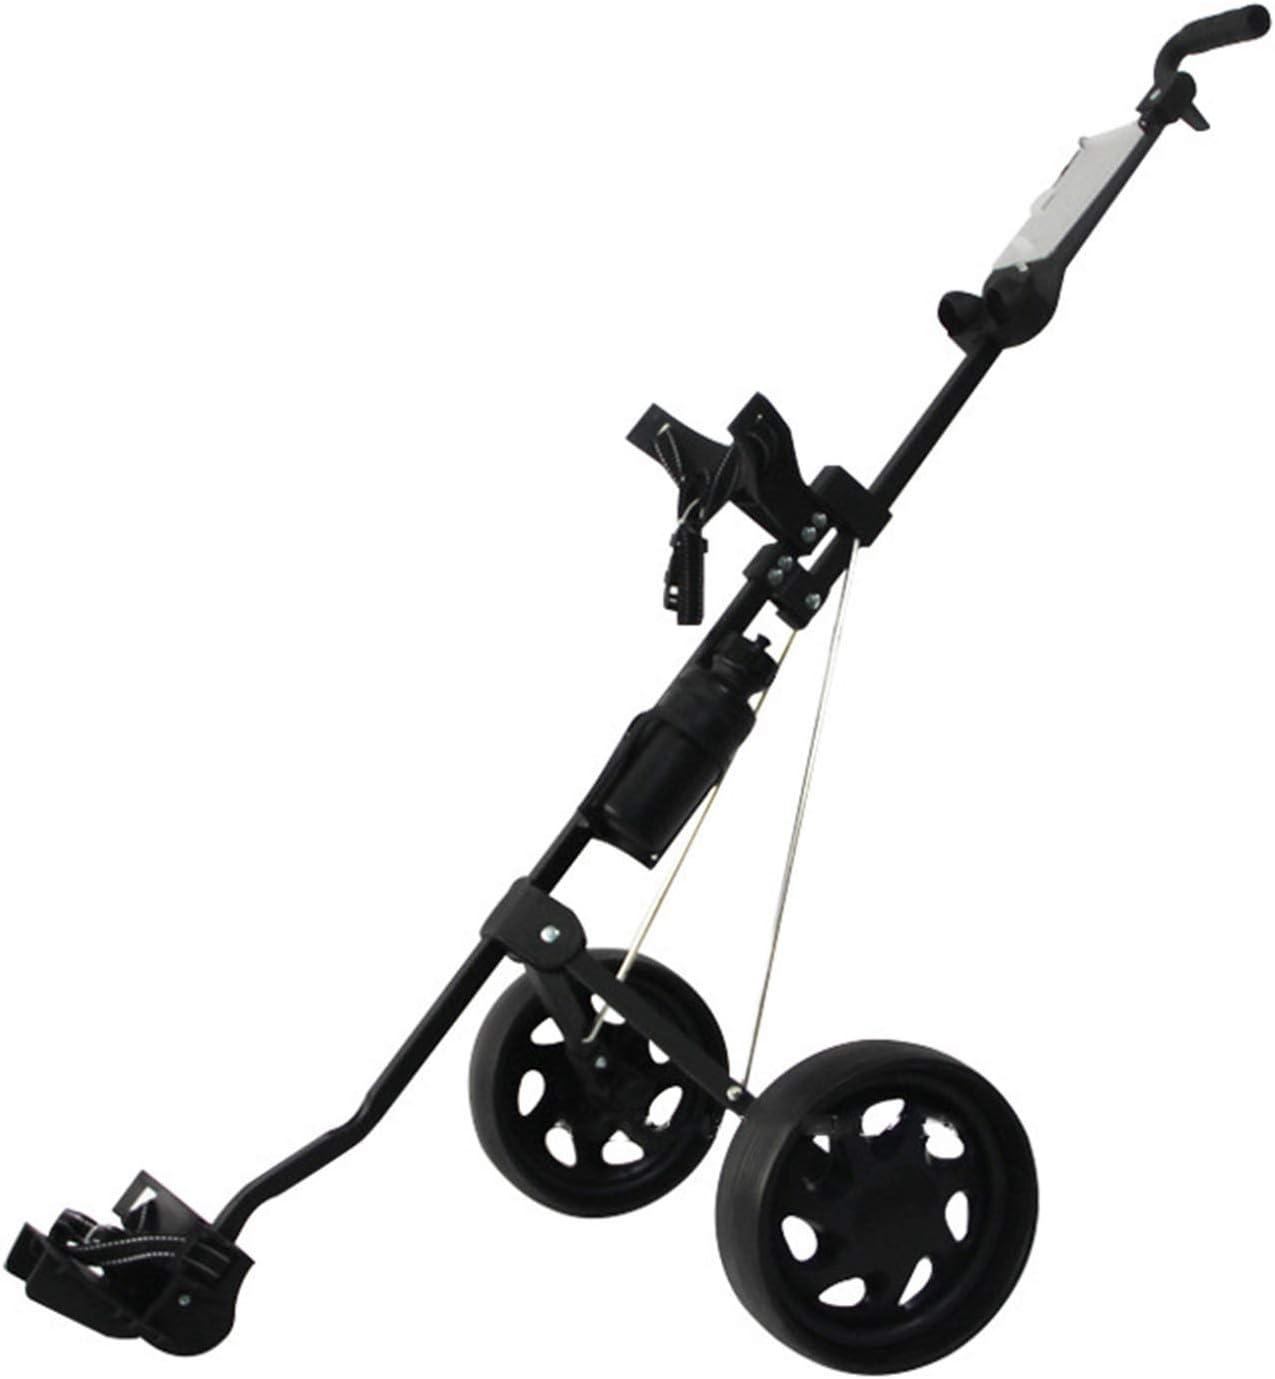 Easy-to-use Golf Push Cart Max 41% OFF Carts 2 Folding Wheel Trolley Blac